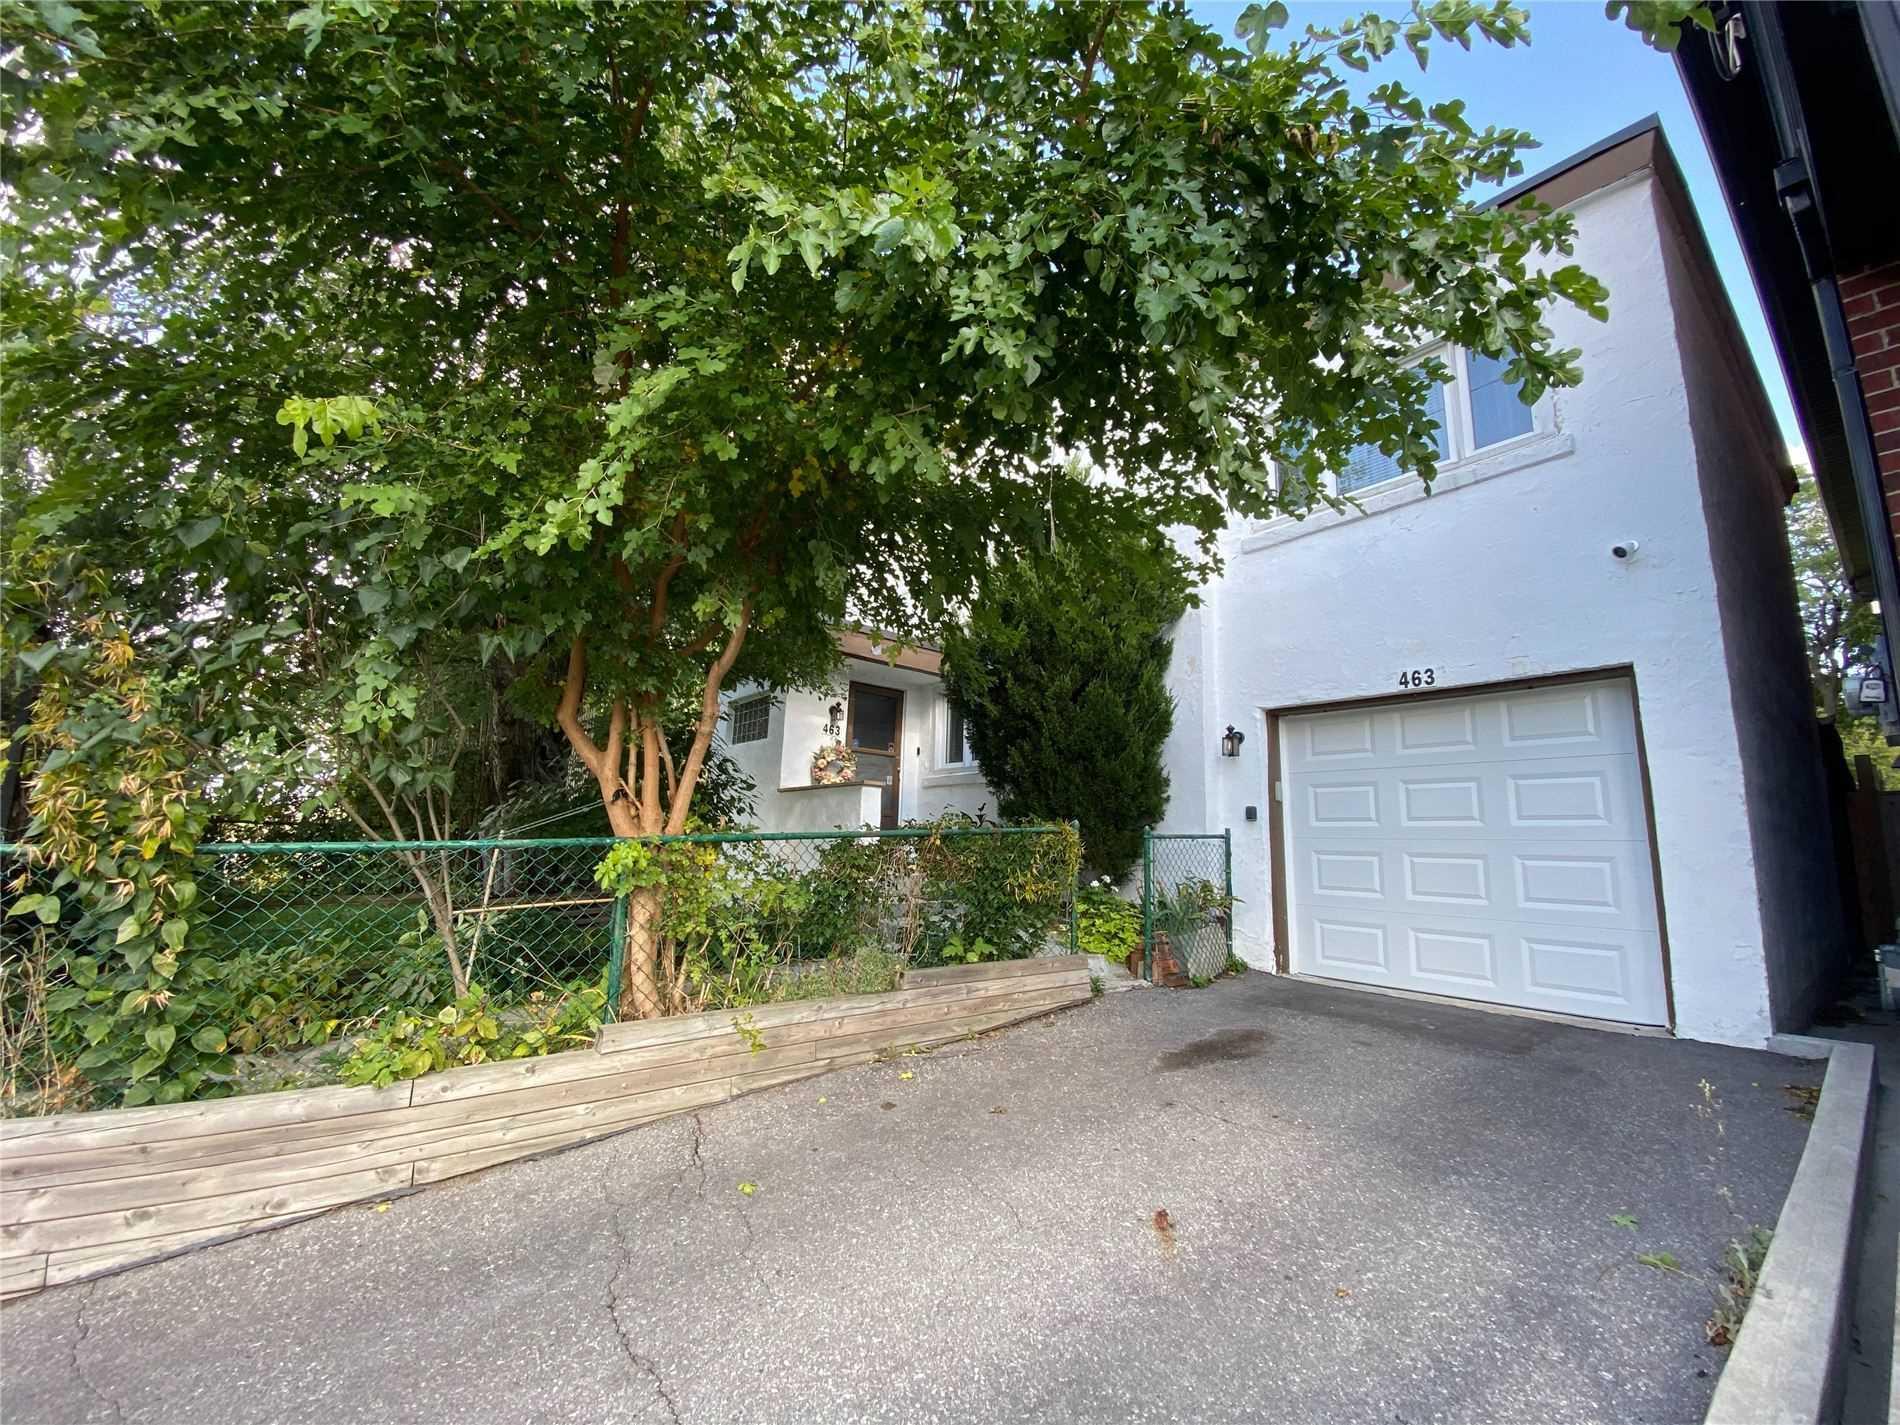 463 Mcroberts Ave, Toronto, Ontario M6E4R1, 3 Bedrooms Bedrooms, 6 Rooms Rooms,2 BathroomsBathrooms,Detached,For Sale,Mcroberts,W4953097